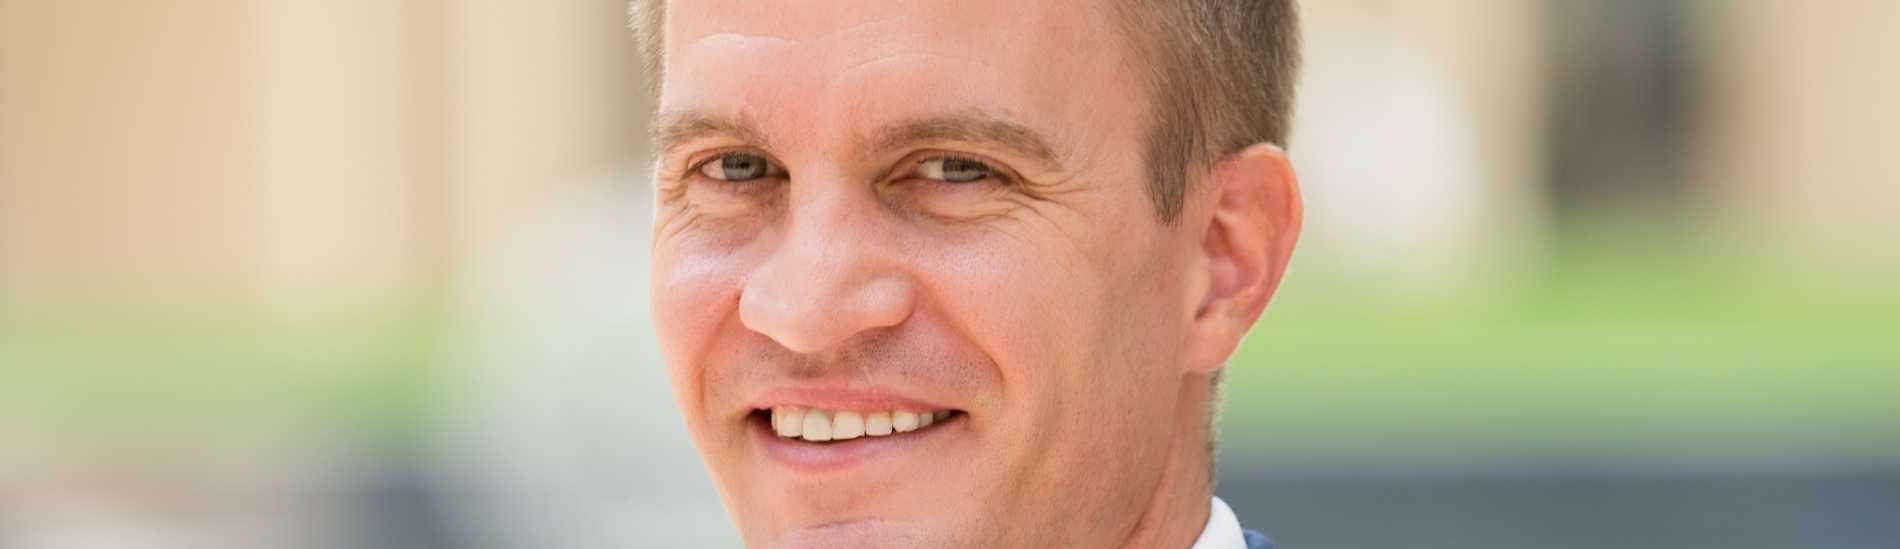 LuxuryProperty.com Welcomes Paul Martin As Associate Director